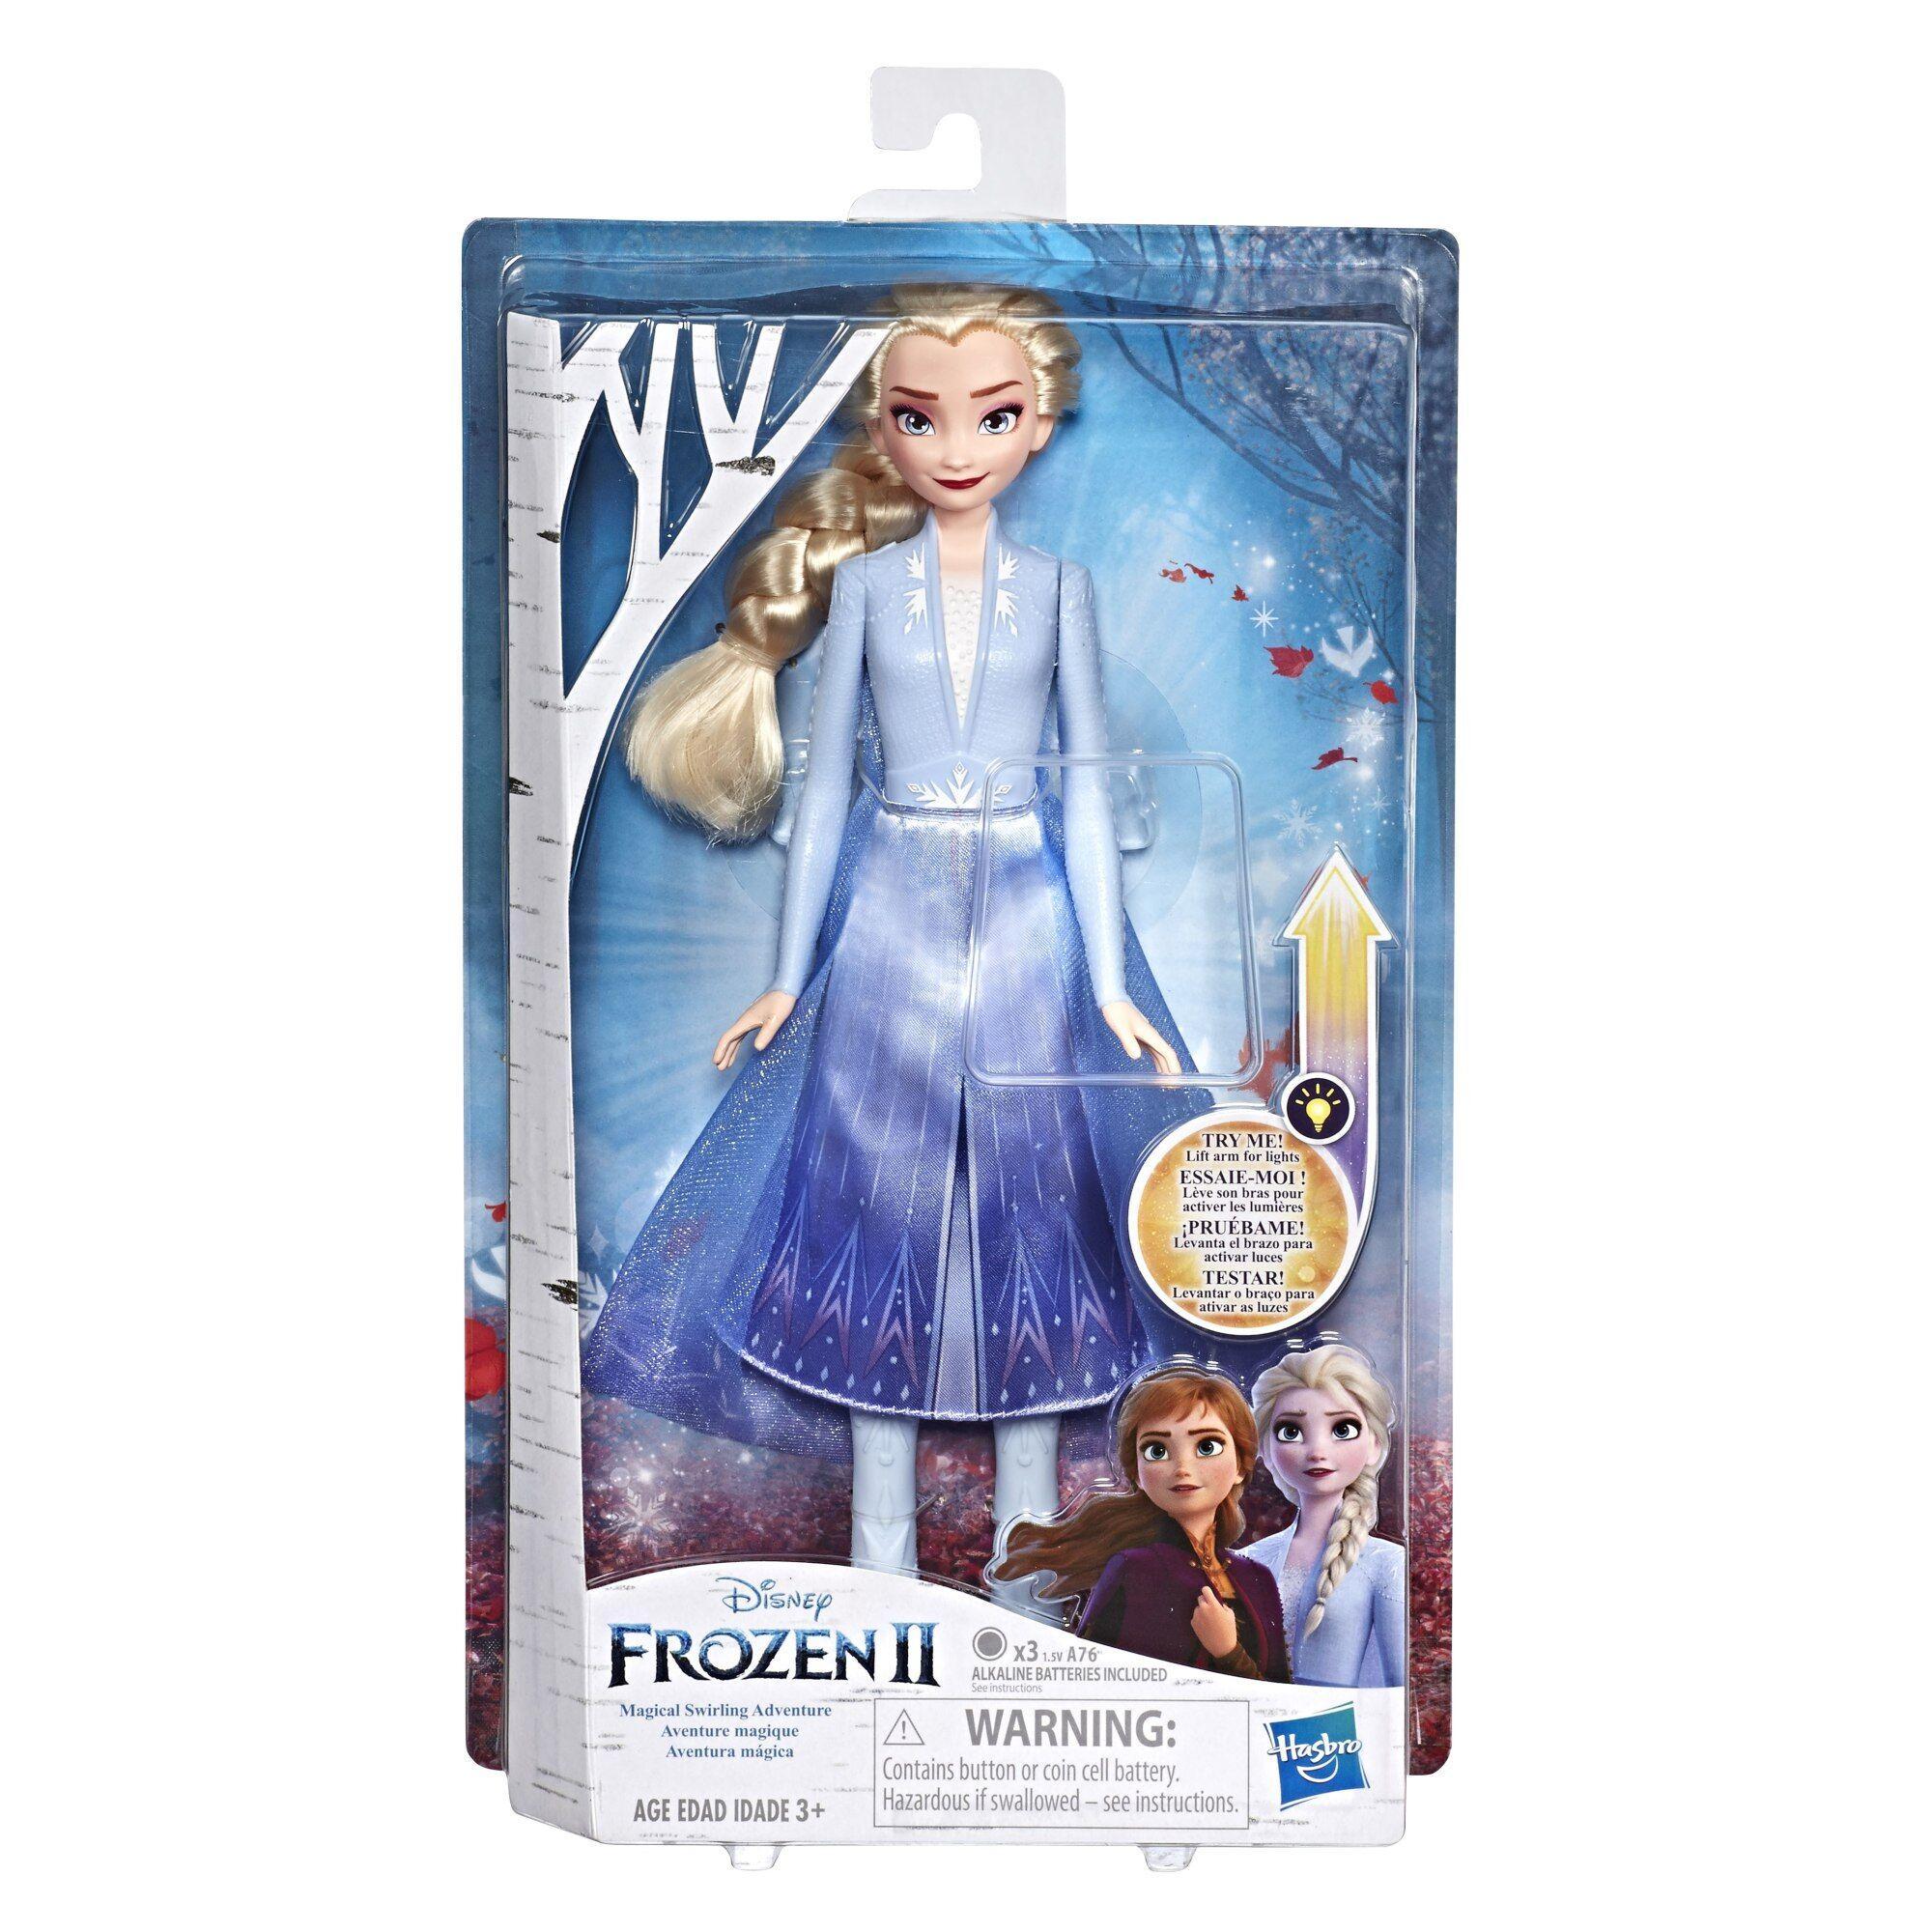 FROZEN Disney Frozen 2 Light Up Fashion nukke